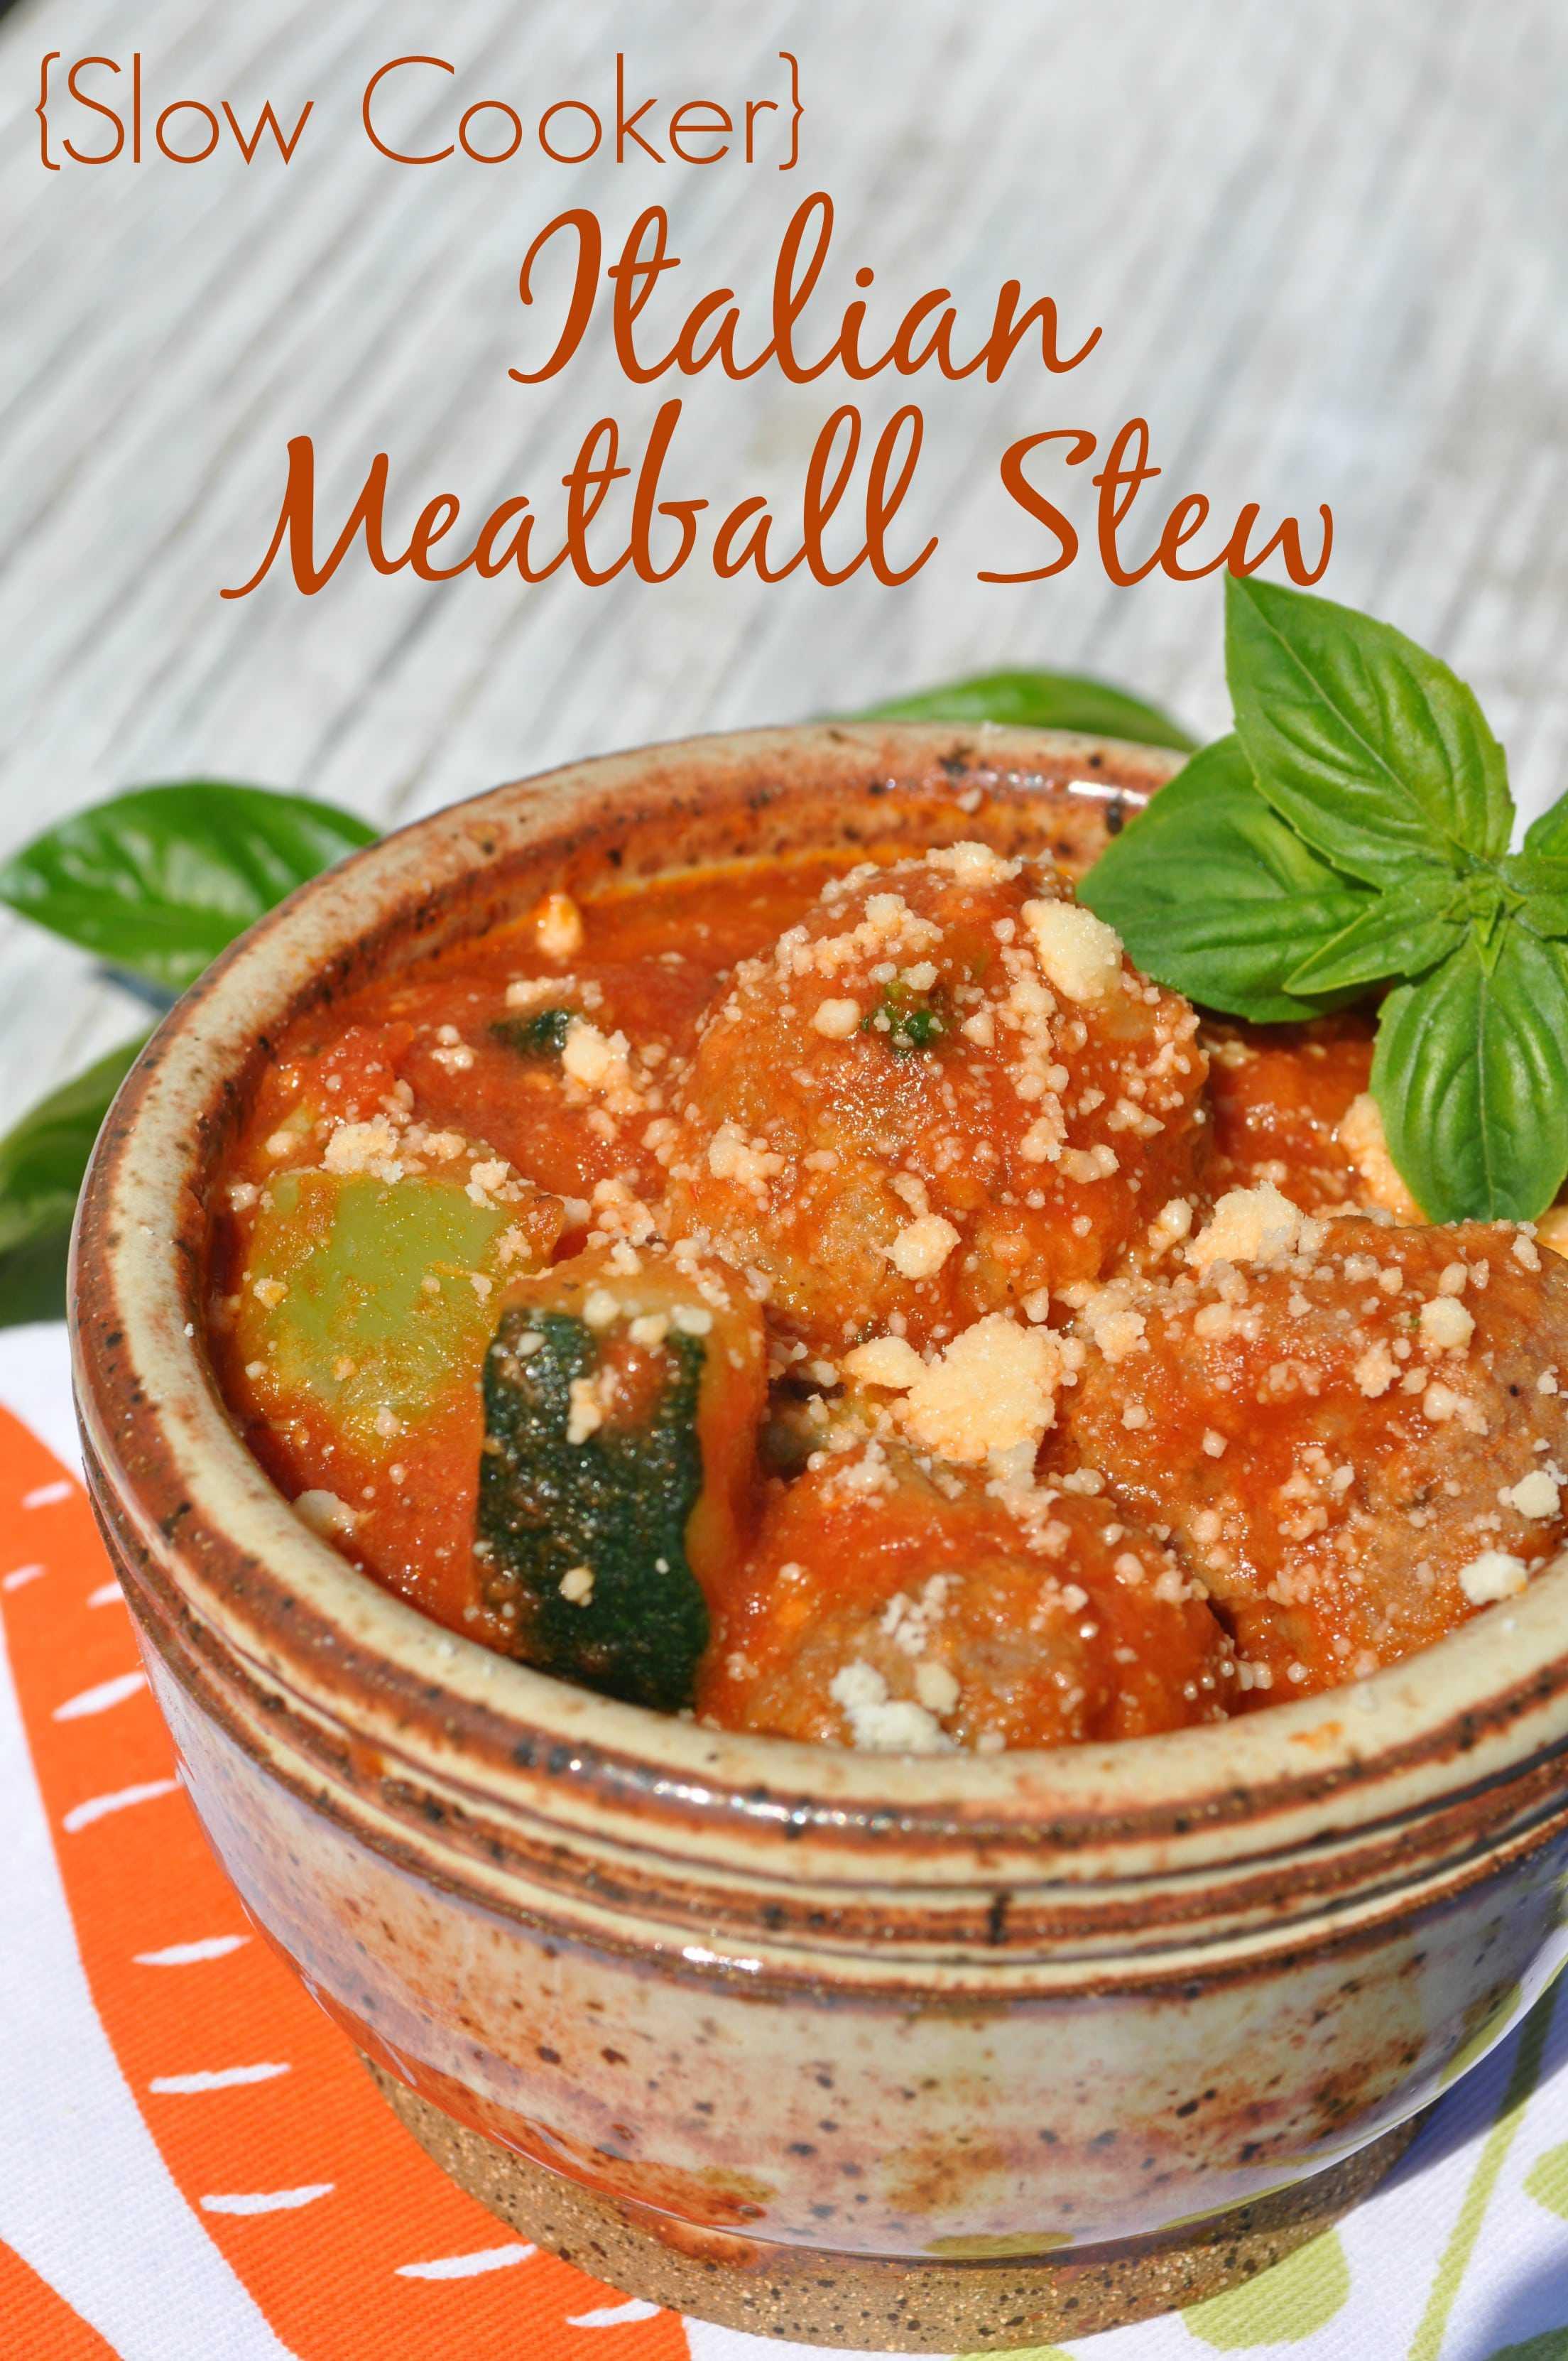 Slow Cooker Italian Meatball Stew #recipe #crockpot #slowcookerrecipes ...